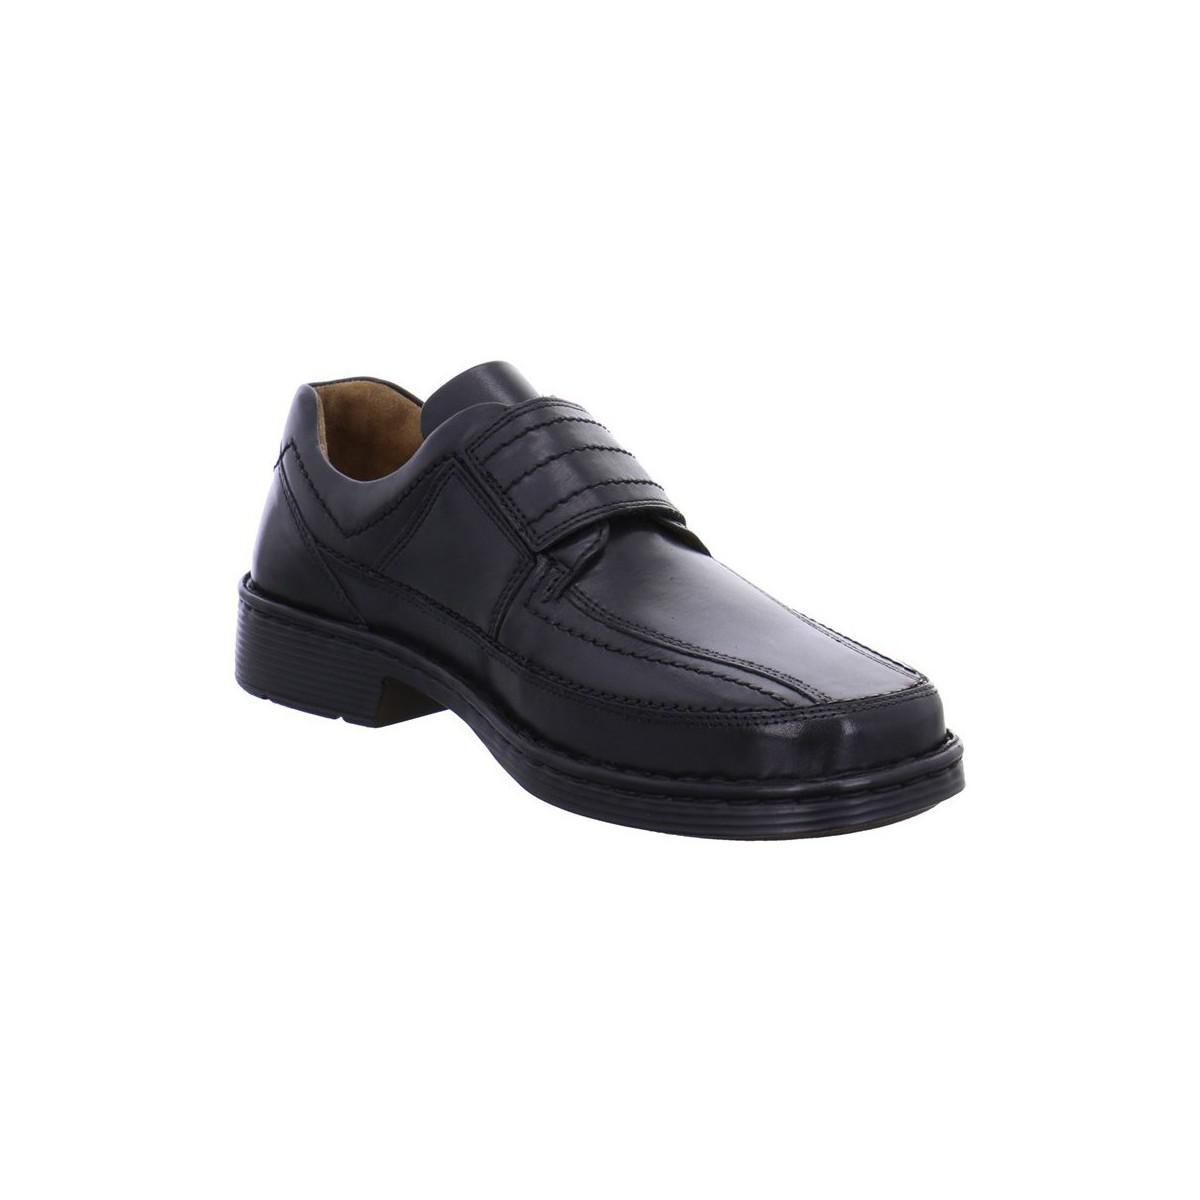 Josef Seibel. Bradford 06 Klett Men's Loafers / Casual Shoes ...